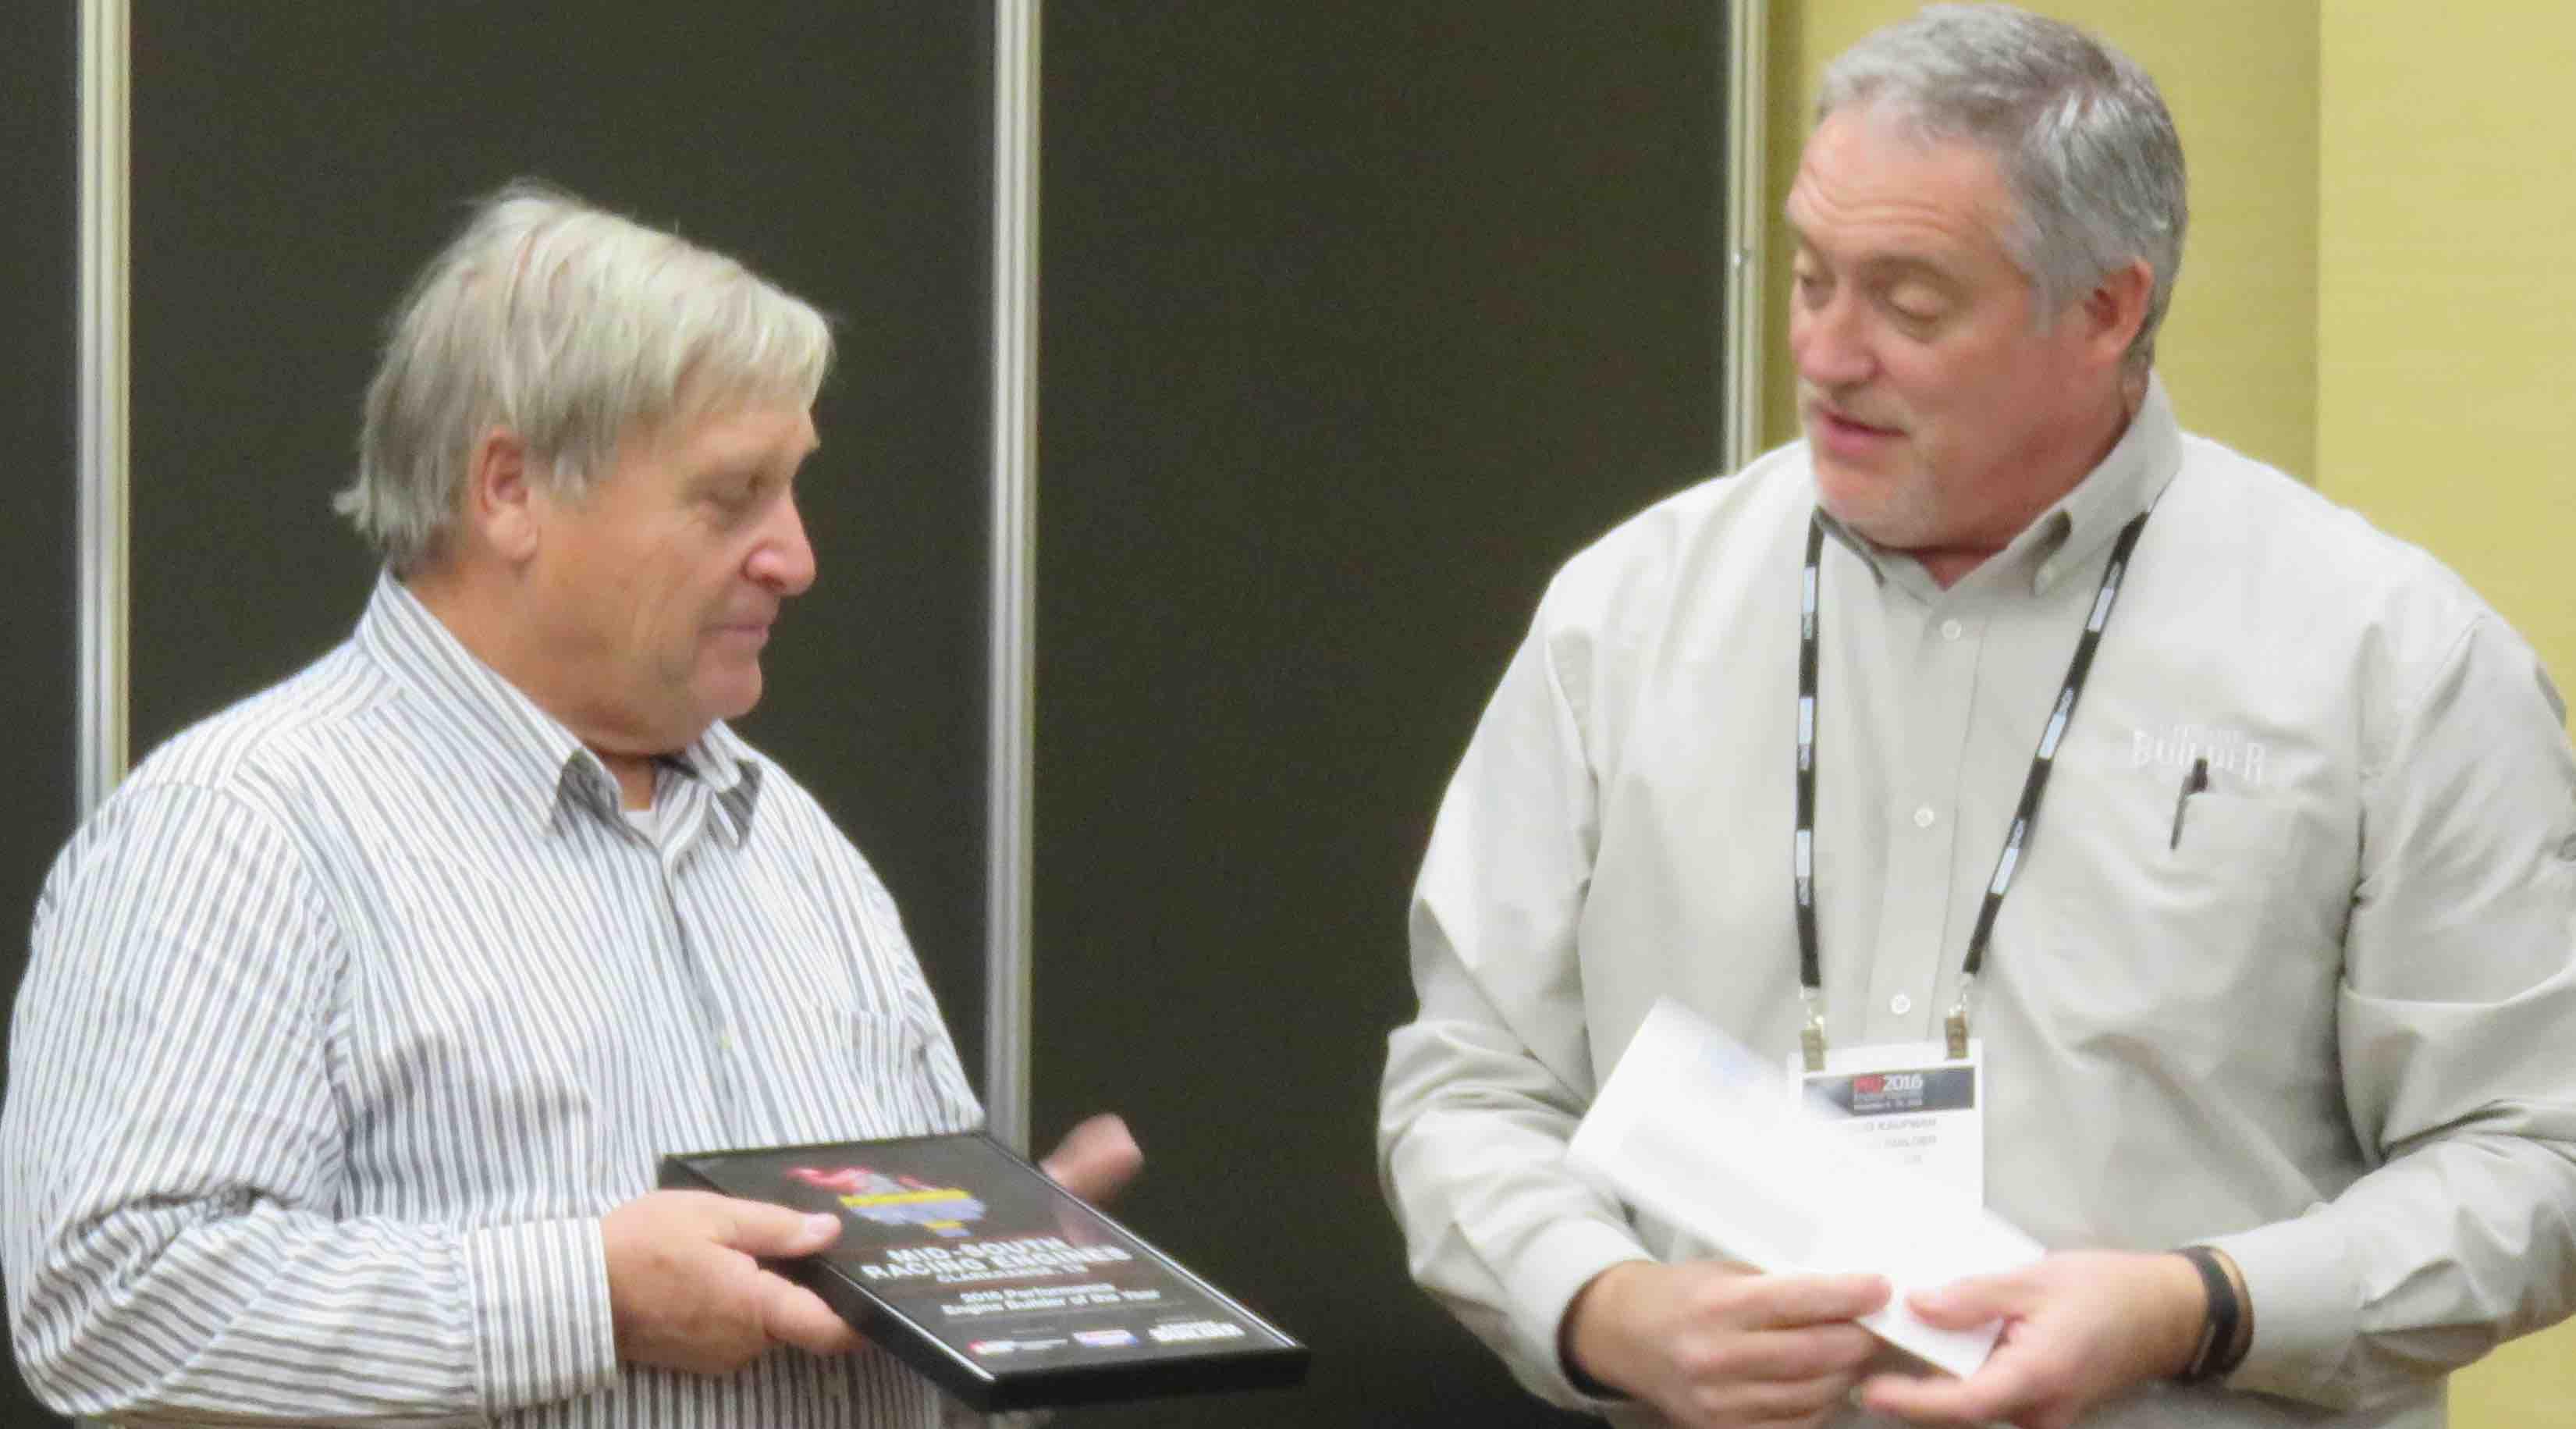 Larry Pritchett (left) and Doug Kaufman (right)